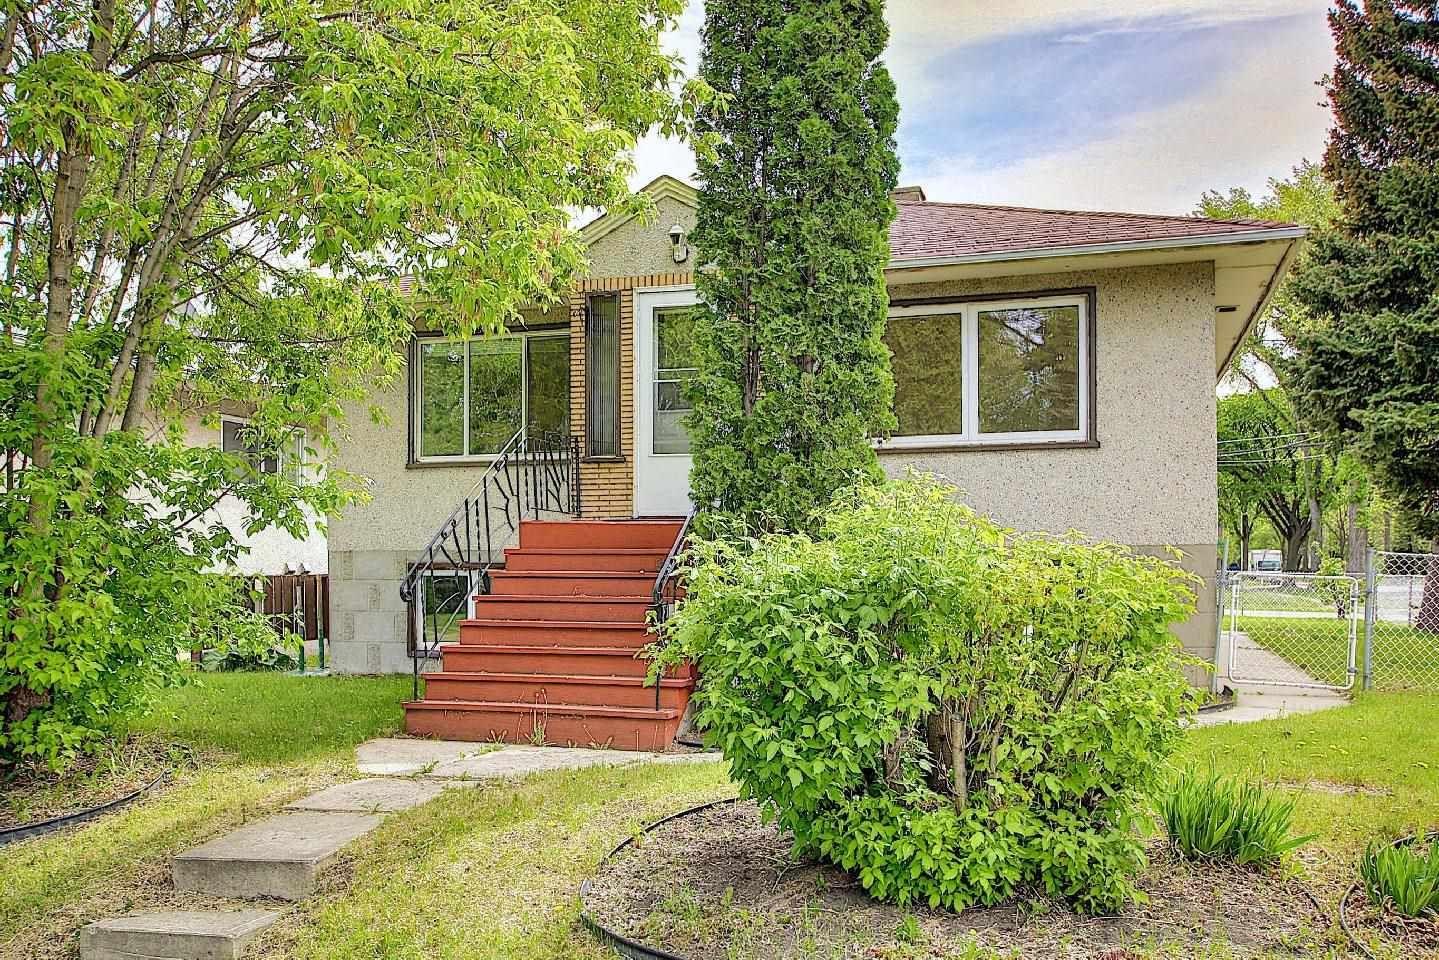 Main Photo: 12803 126 Street in Edmonton: Zone 01 House for sale : MLS®# E4247488